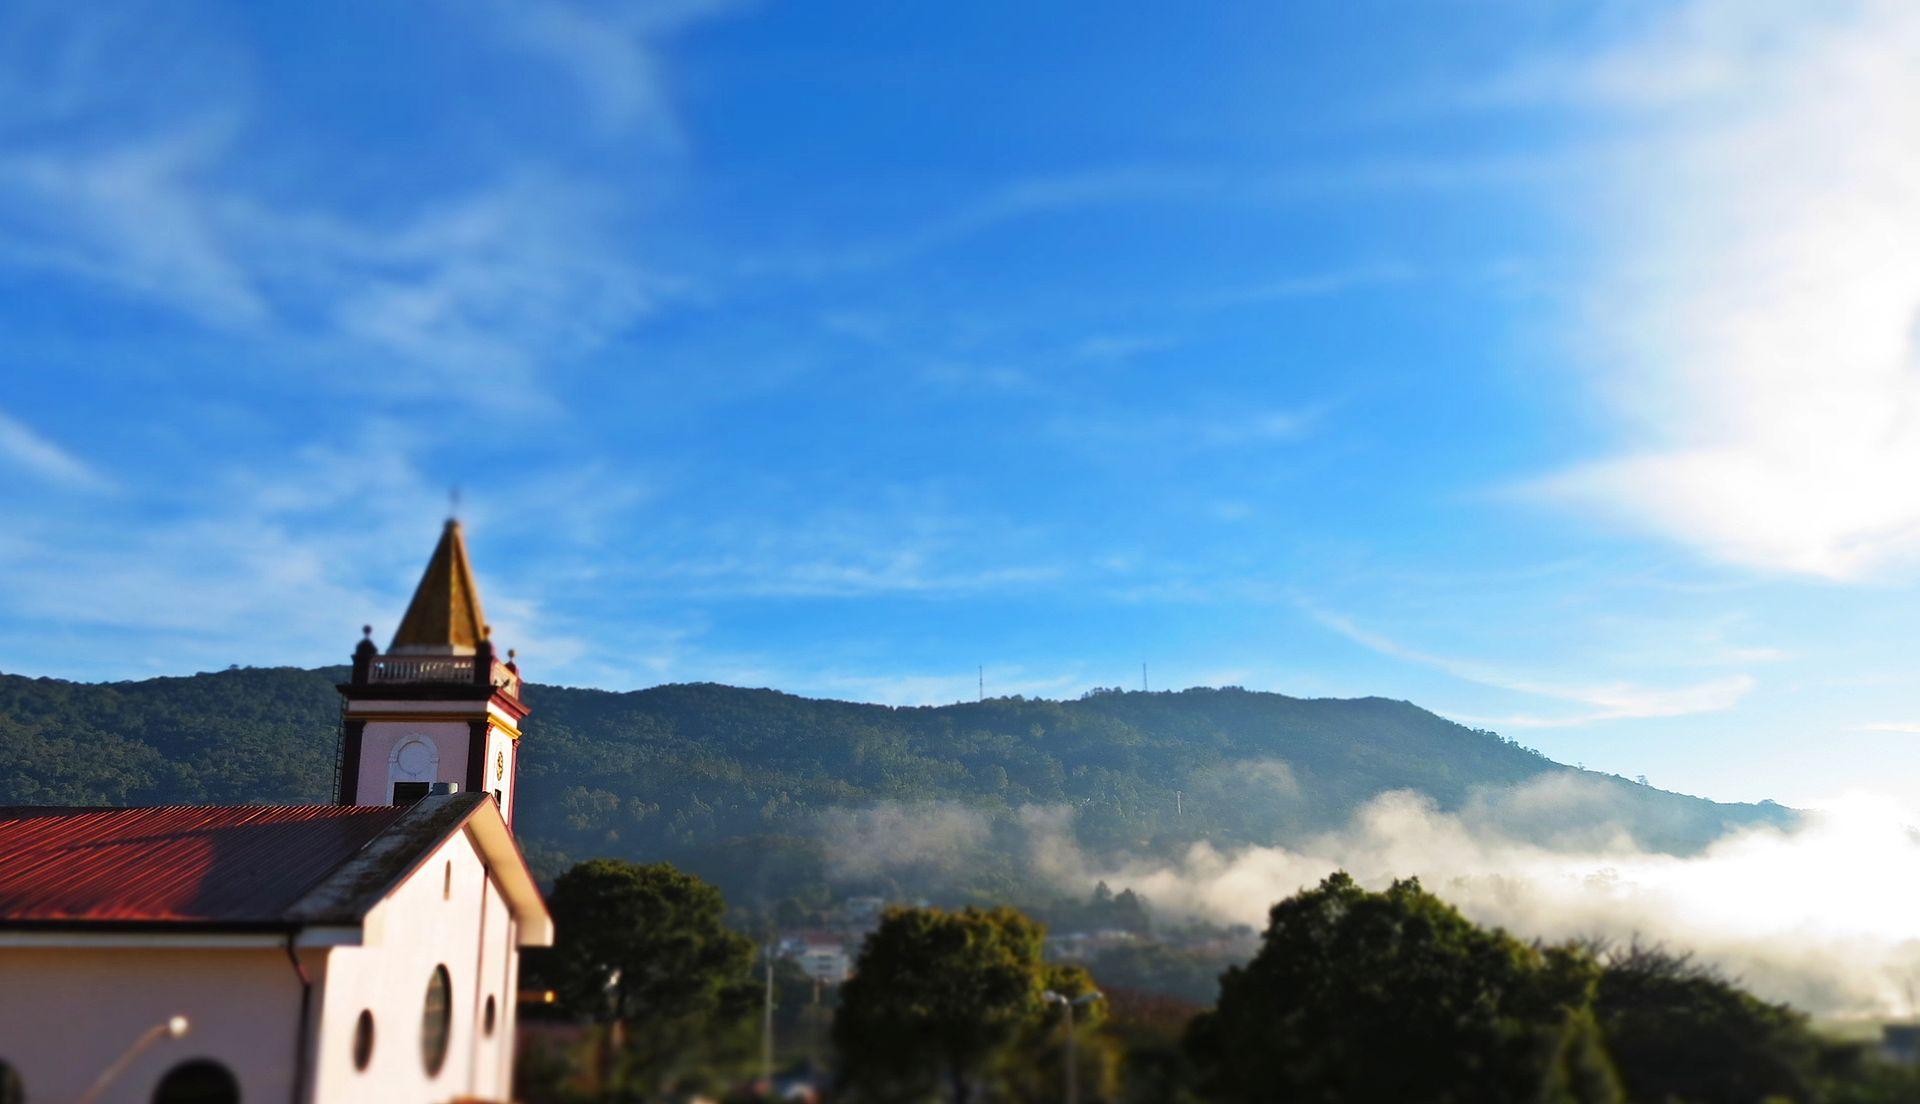 Igreja Matriz e Morro do Juquery